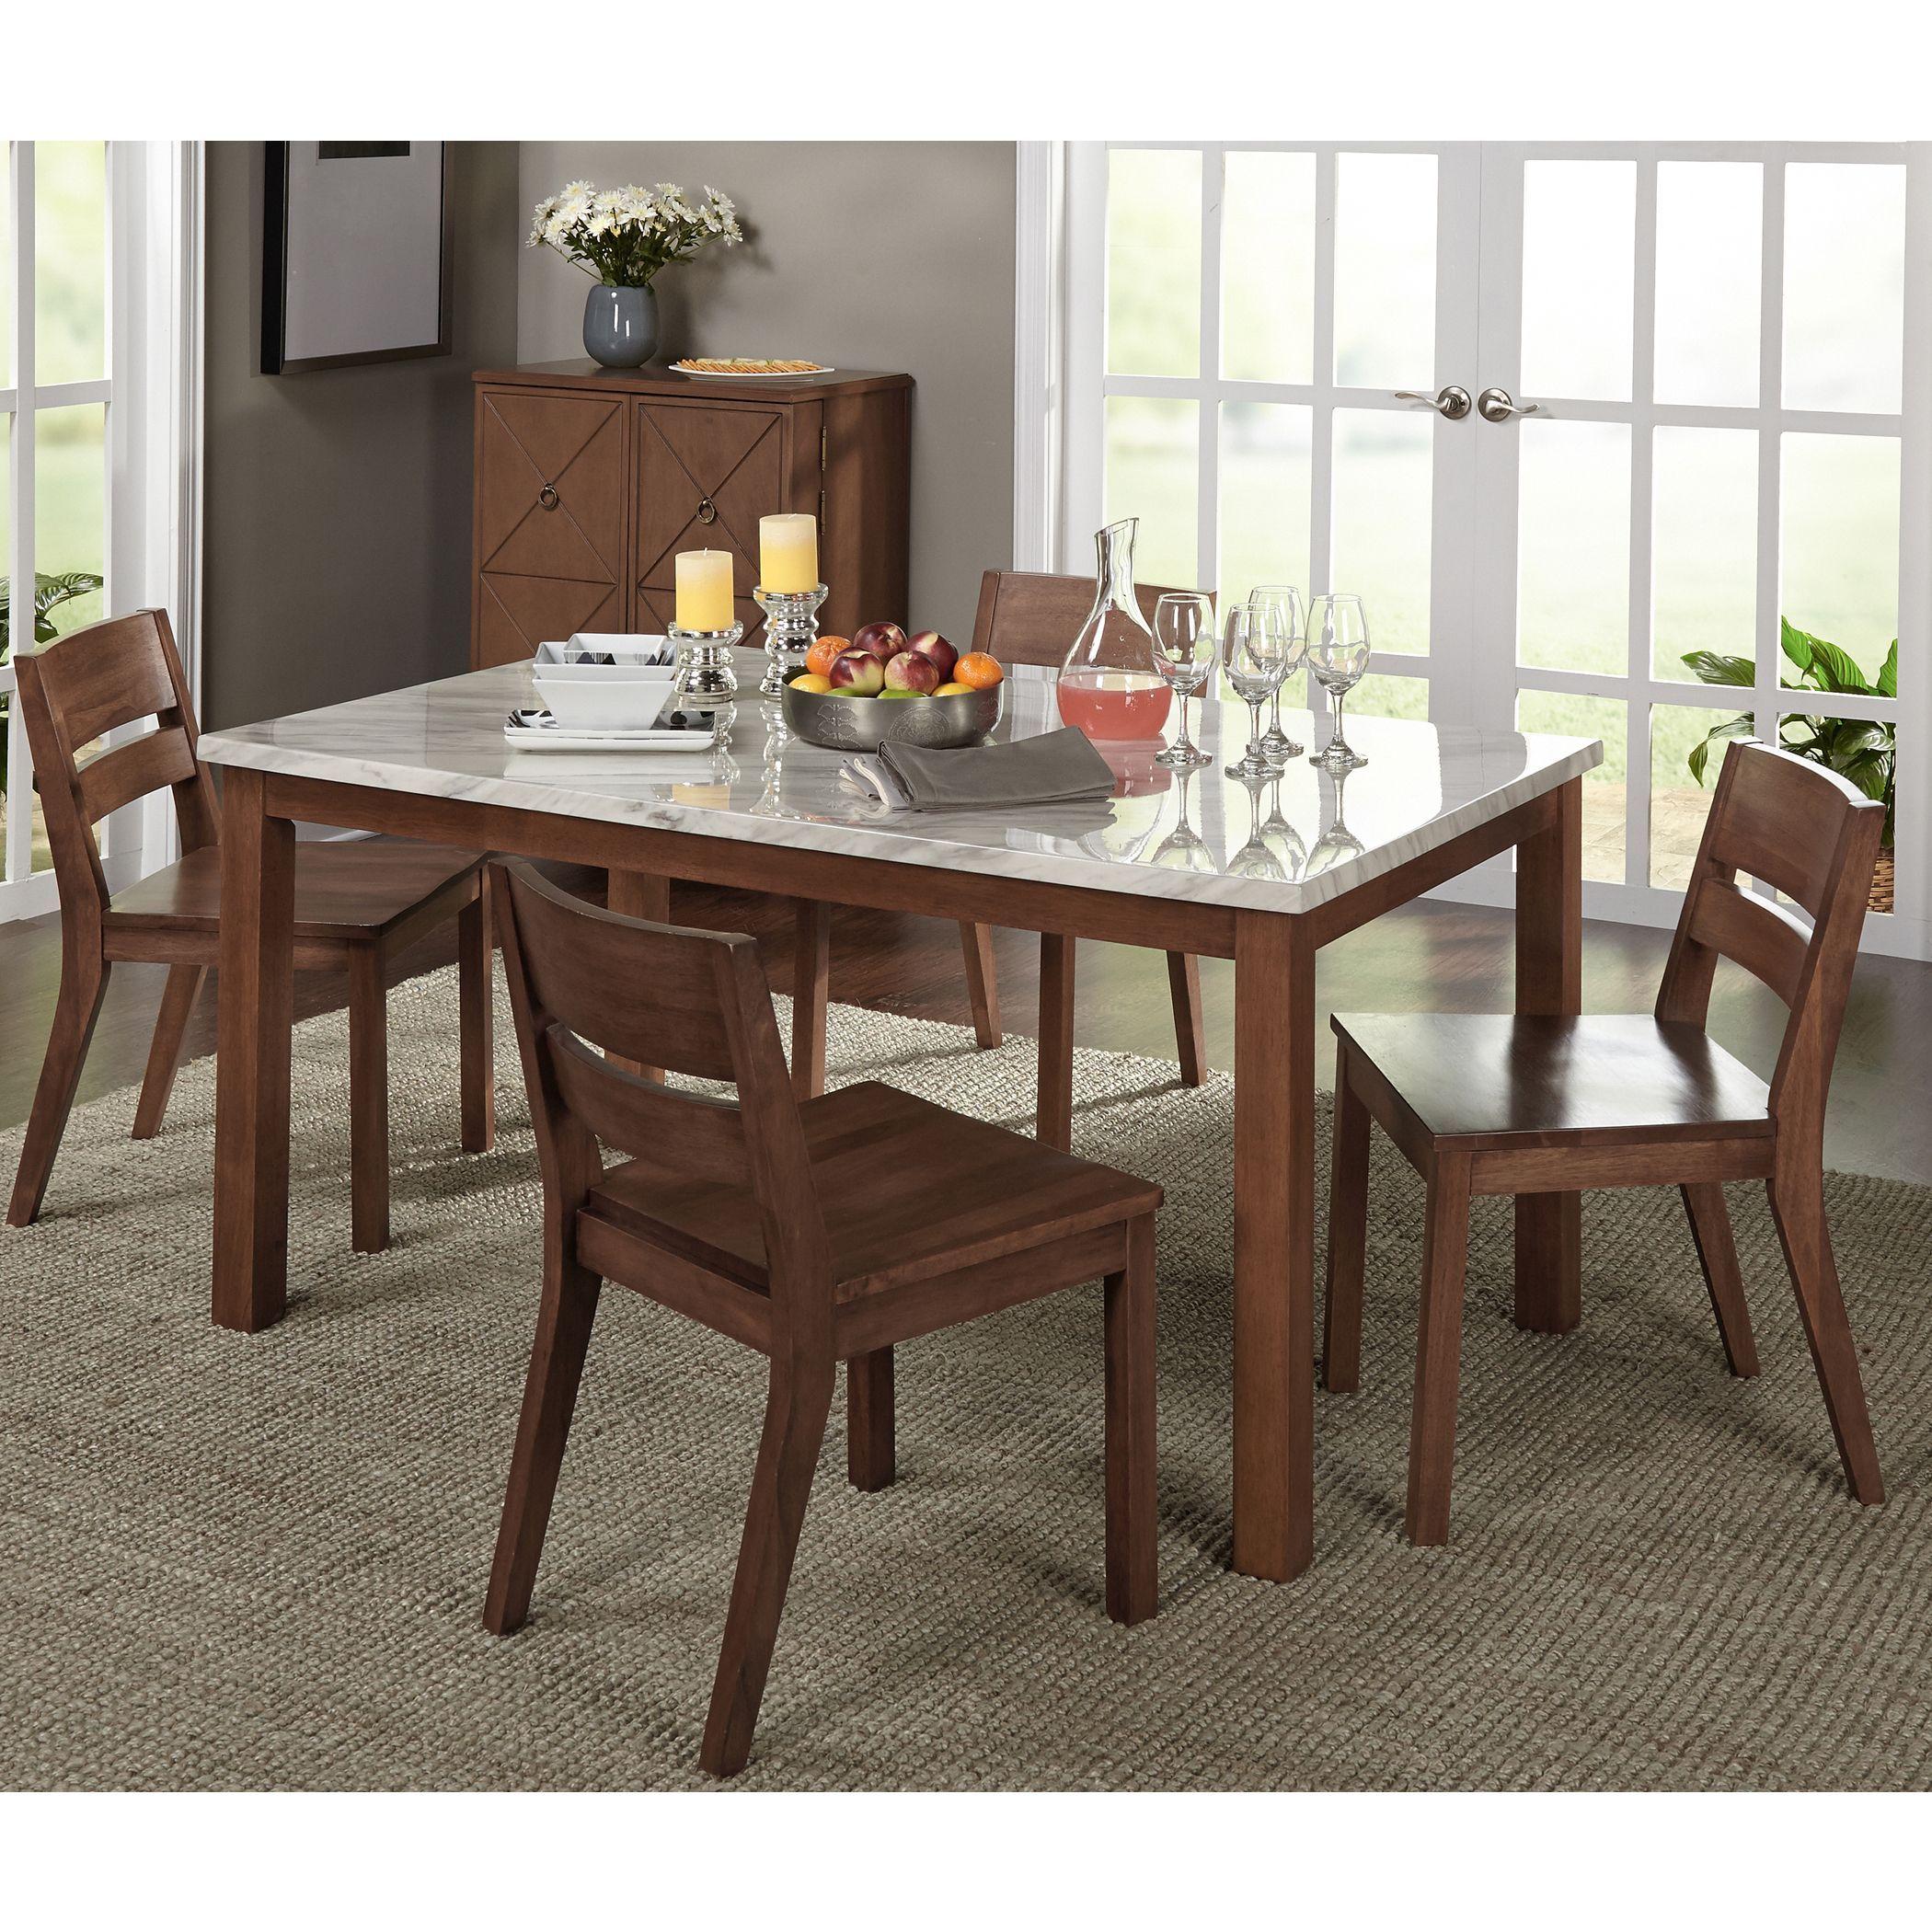 Simple Living 5 Piece Edina Dining Set By Simple Living. Online FurnitureFurniture  OutletSimple ...